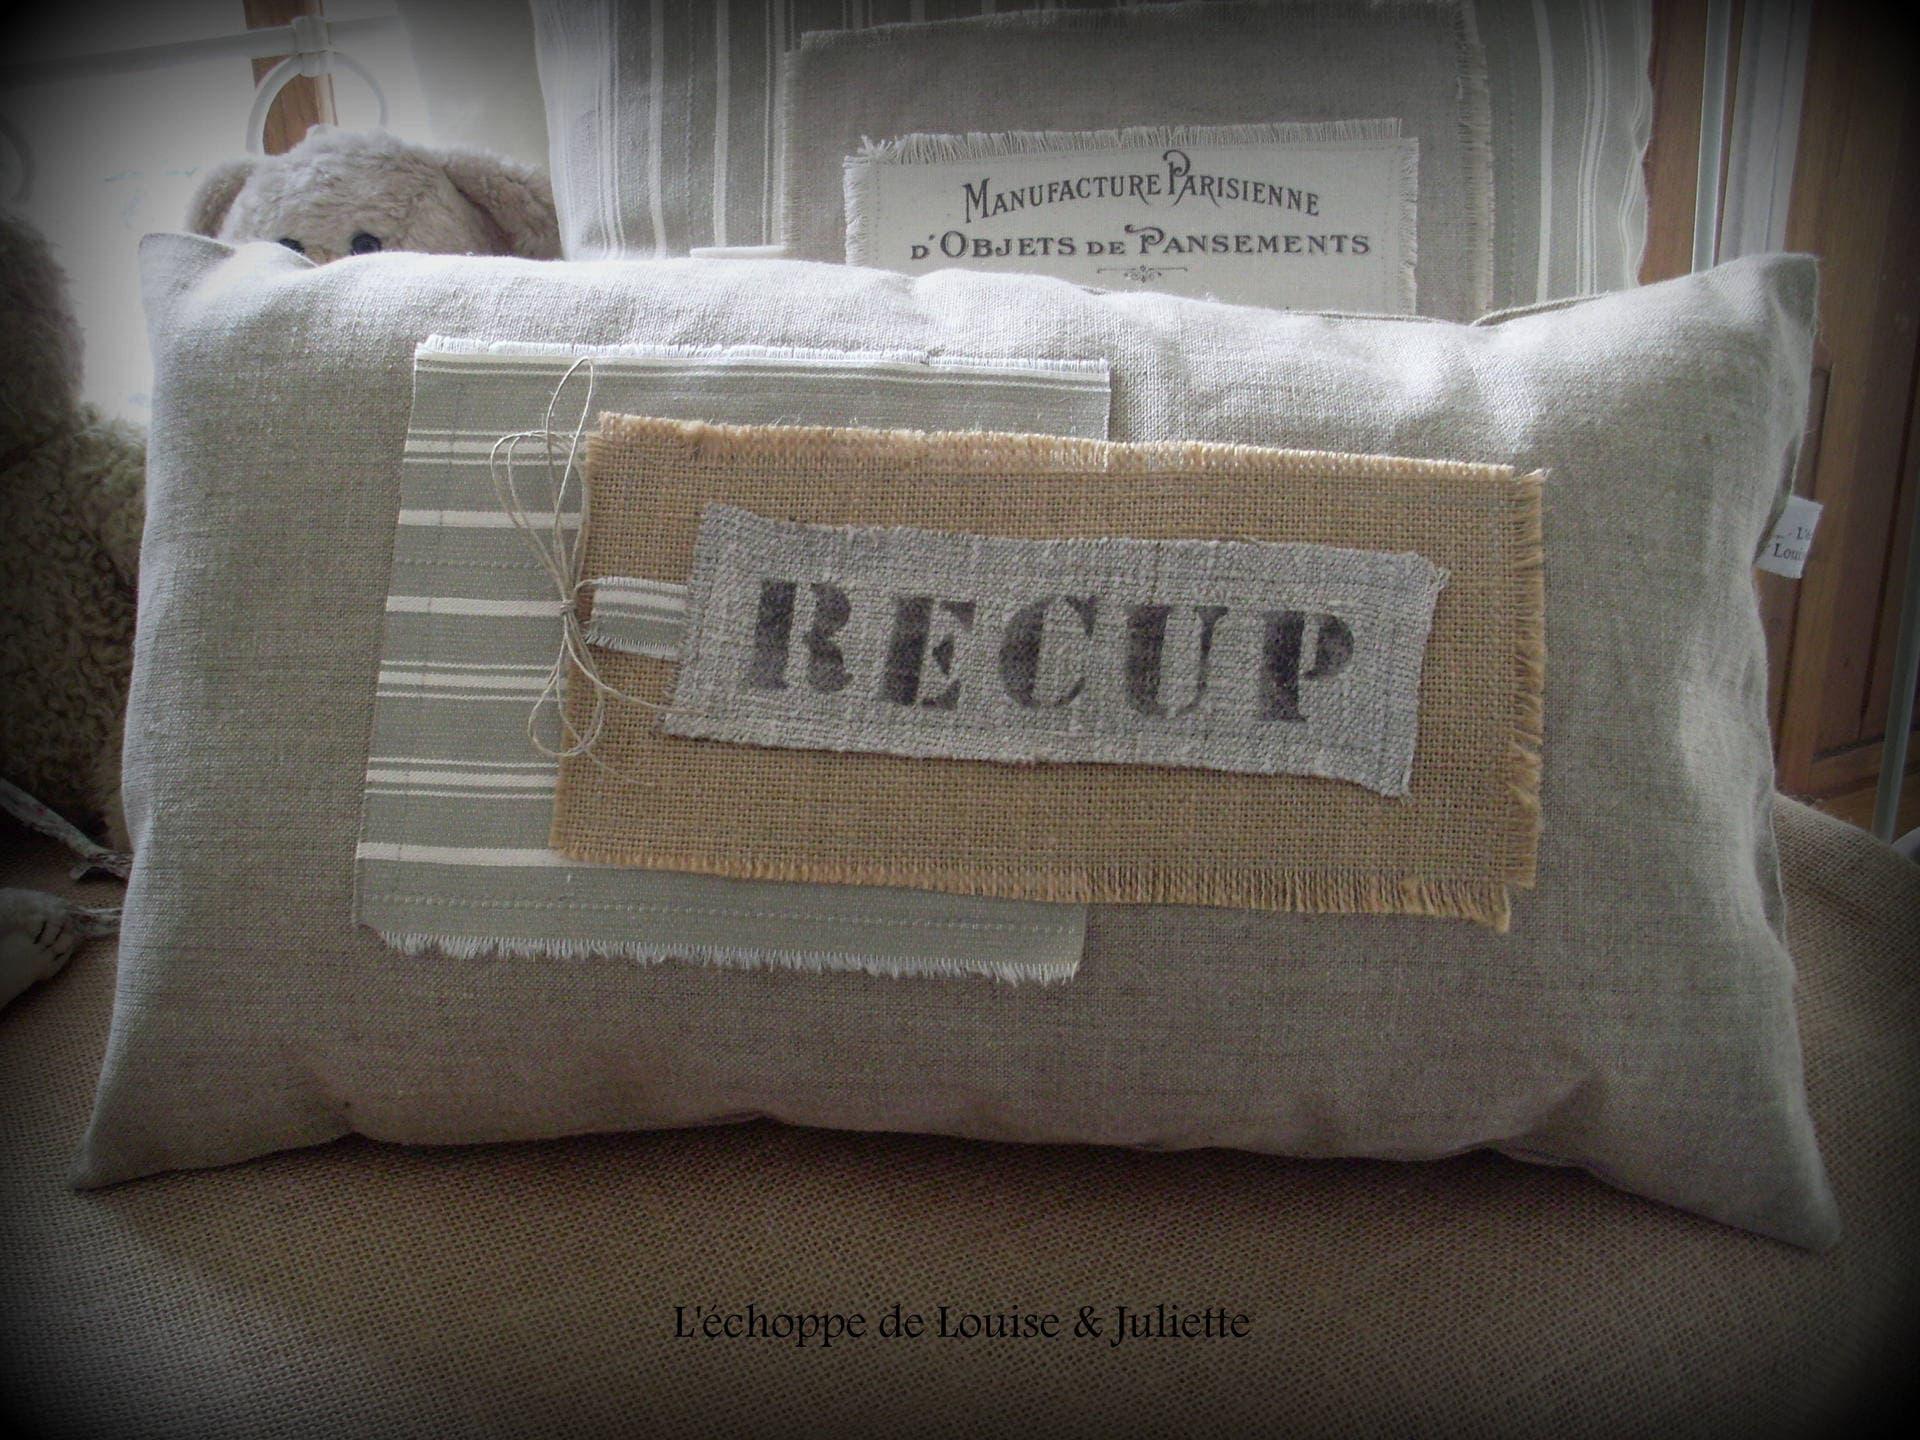 coussin esprit industriel. Black Bedroom Furniture Sets. Home Design Ideas